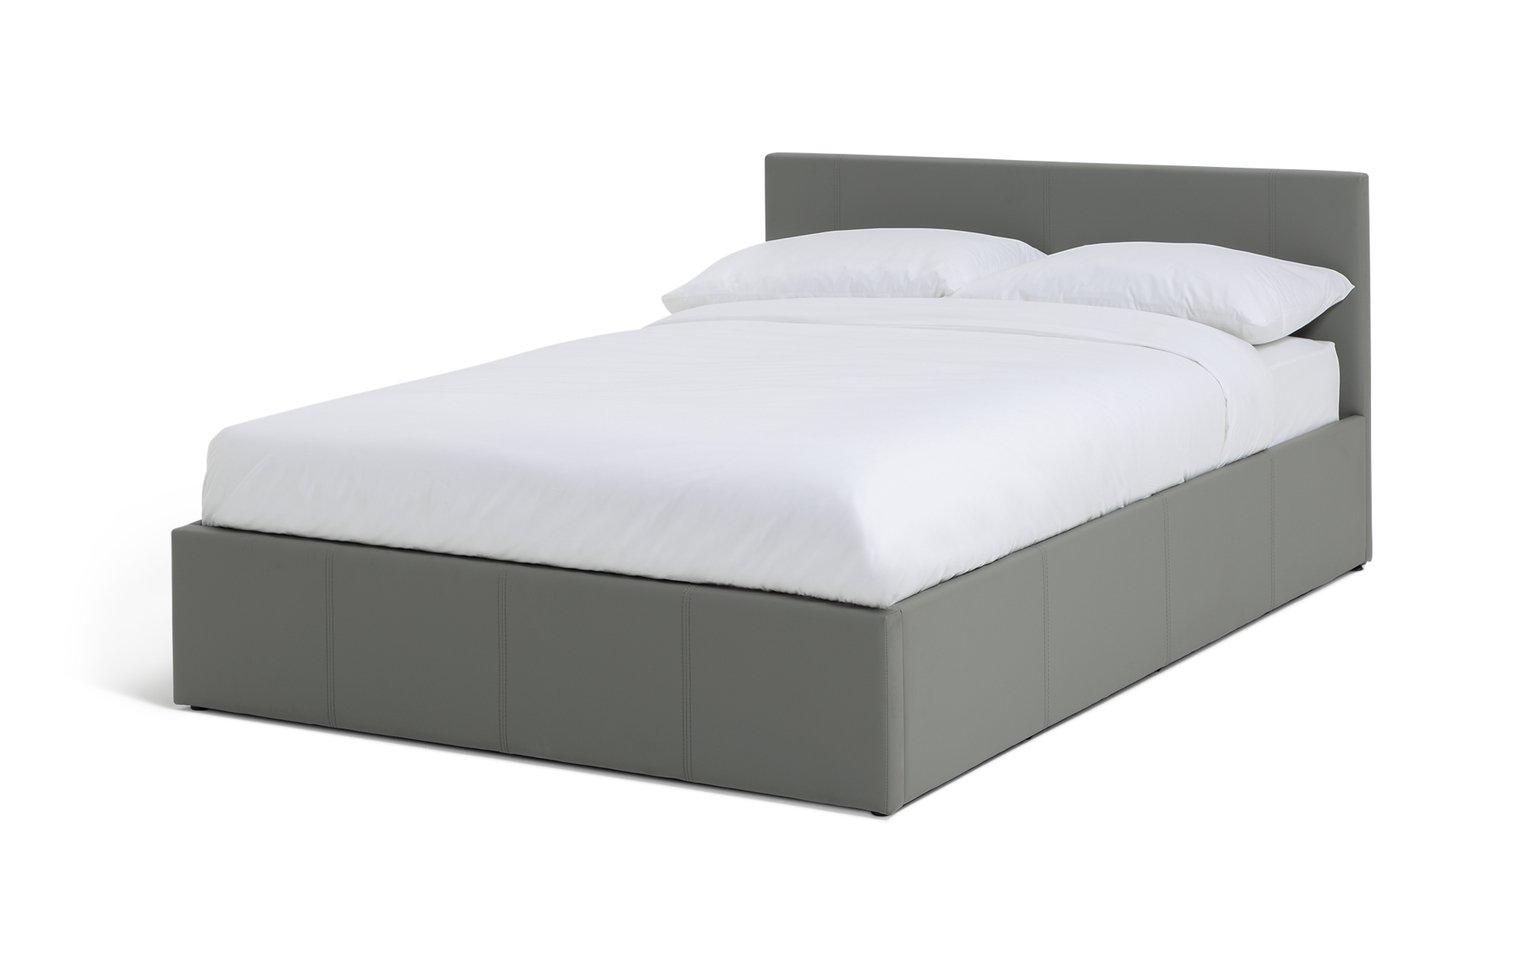 faux leather ottoman. Hygena Lavendon Double Faux Leather Ottoman Bed Frame - Grey